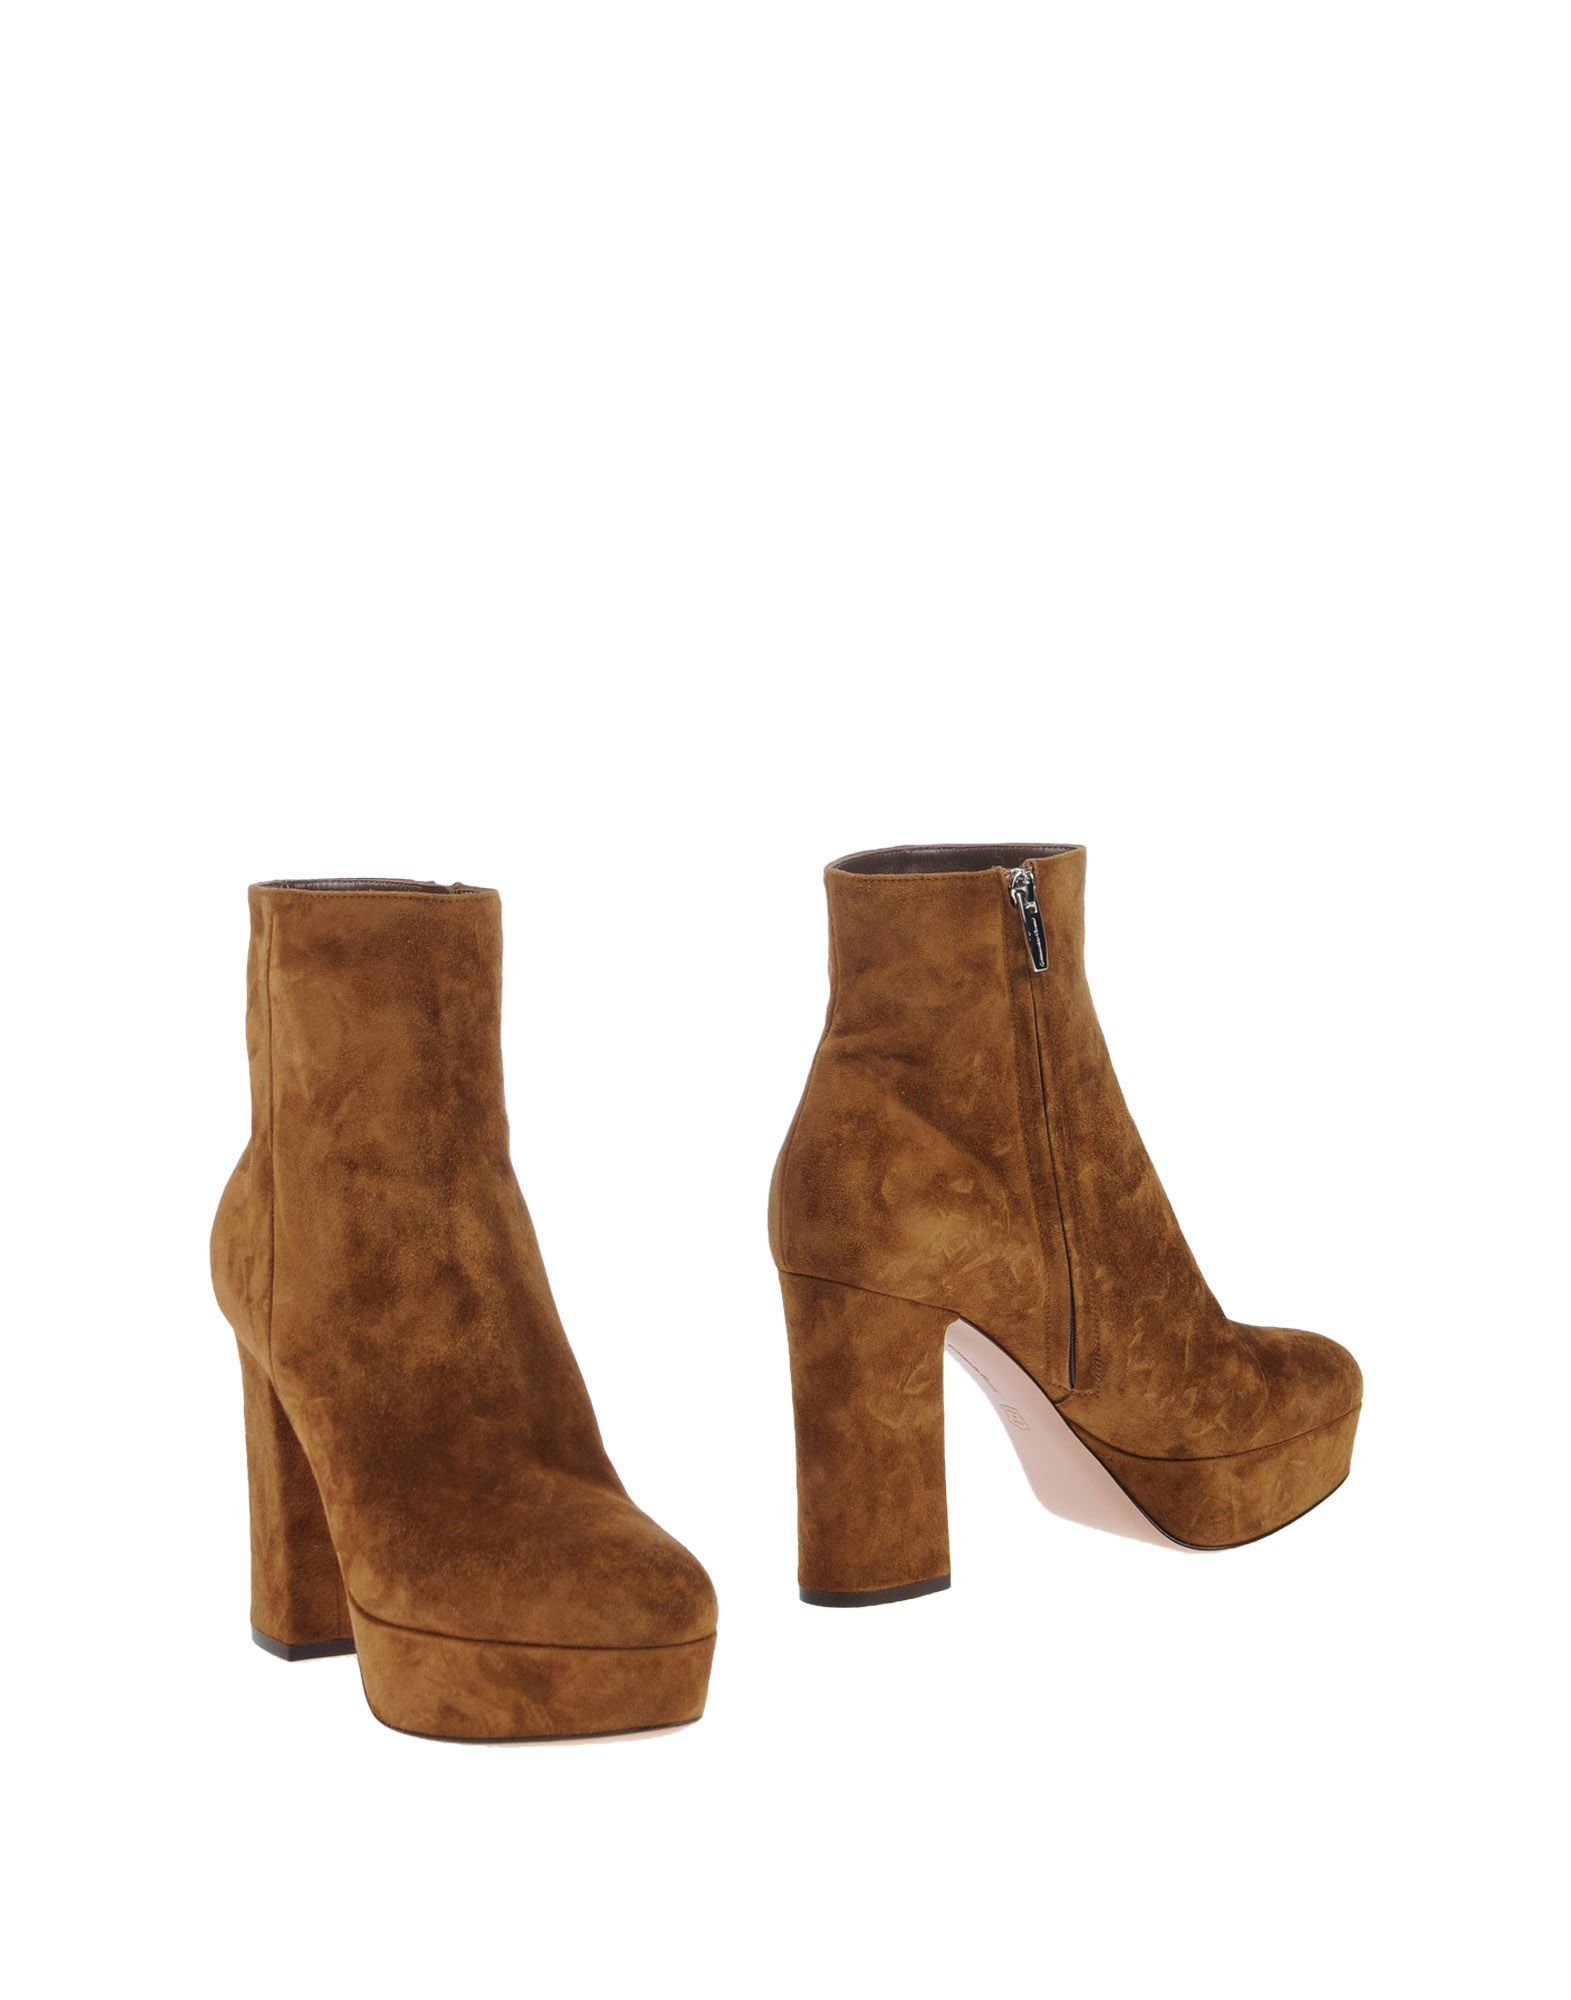 Gianvito Rossi Ankle Boot - Women Gianvito Rossi  Ankle Boots online on  Rossi Australia - 11487342KI eb23ec